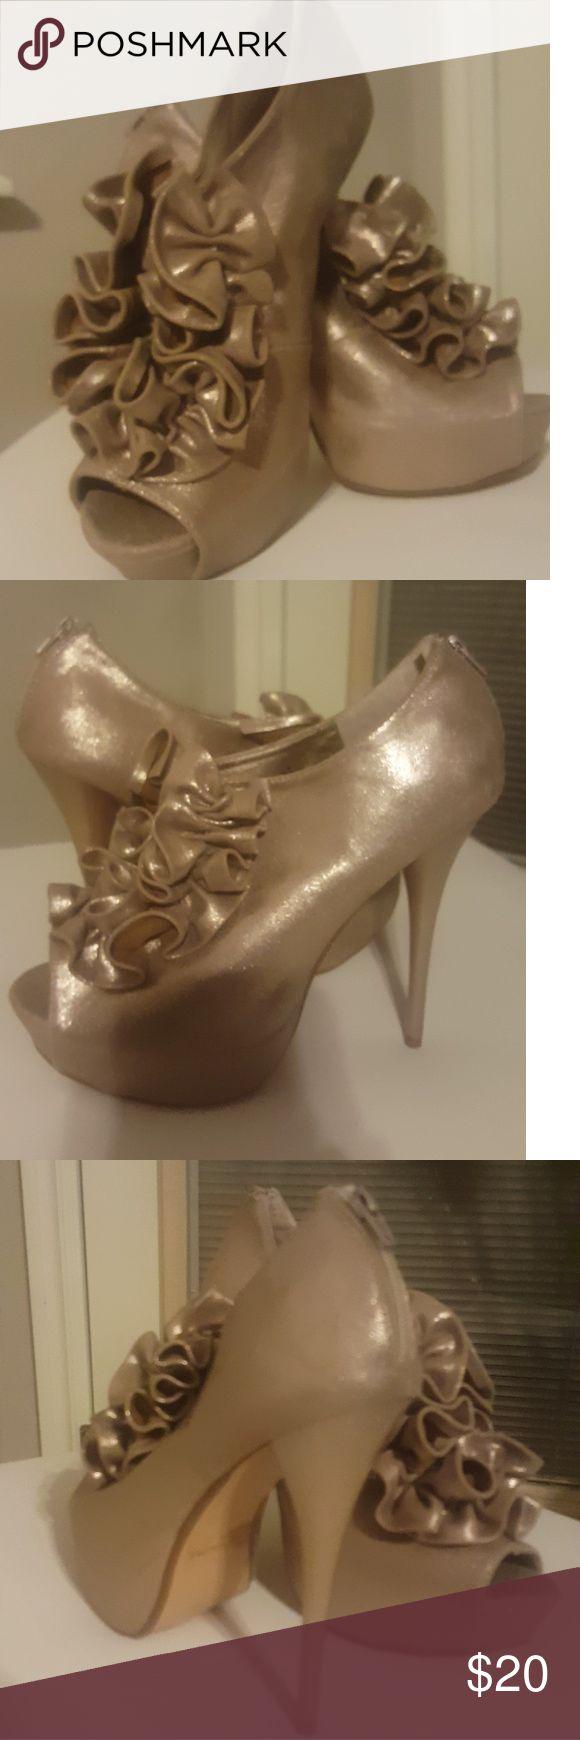 CHARLOTTE RUSSE Gold Ruffled Heels Charlotte Russe Pretty in Ruffles Charlotte Russe Shoes Heels